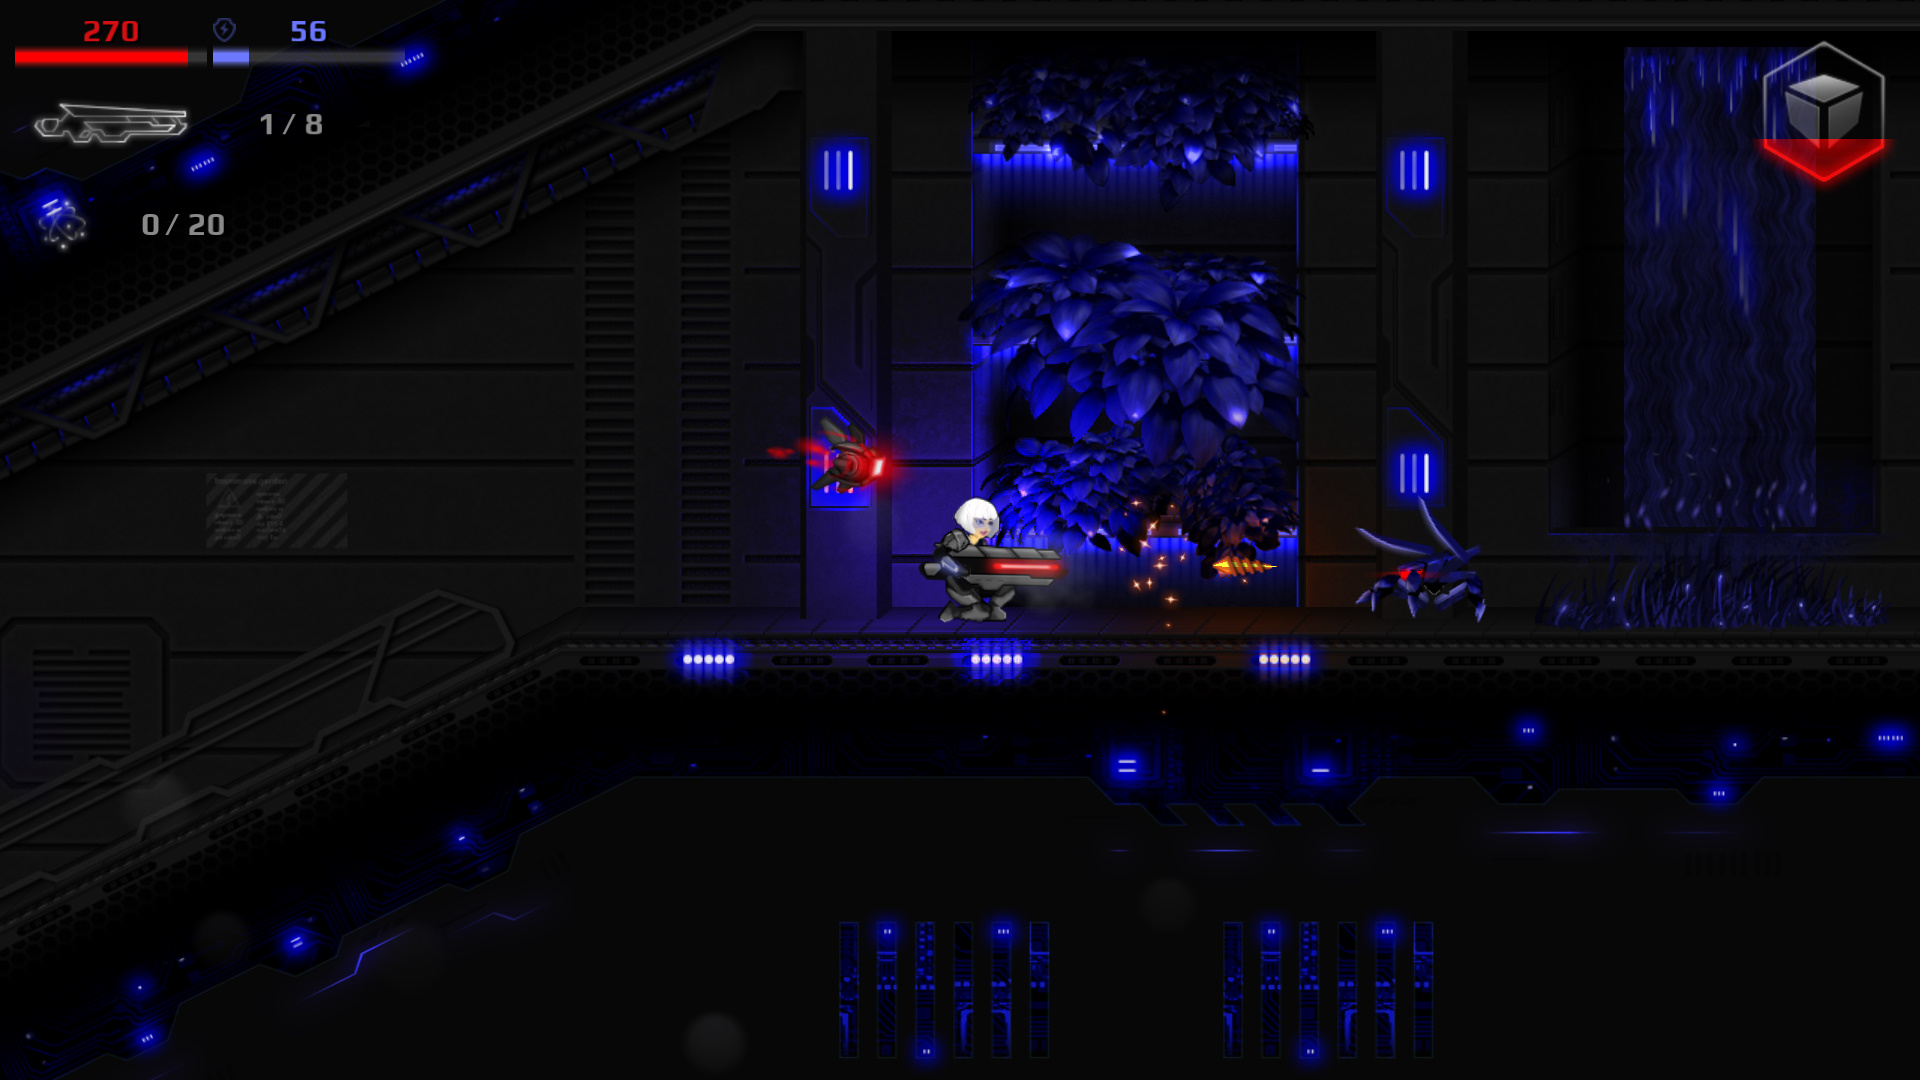 Smelted Kin screenshot 4 | Smelted Kin [экшен-платформер] [Доступно ДЕМО]